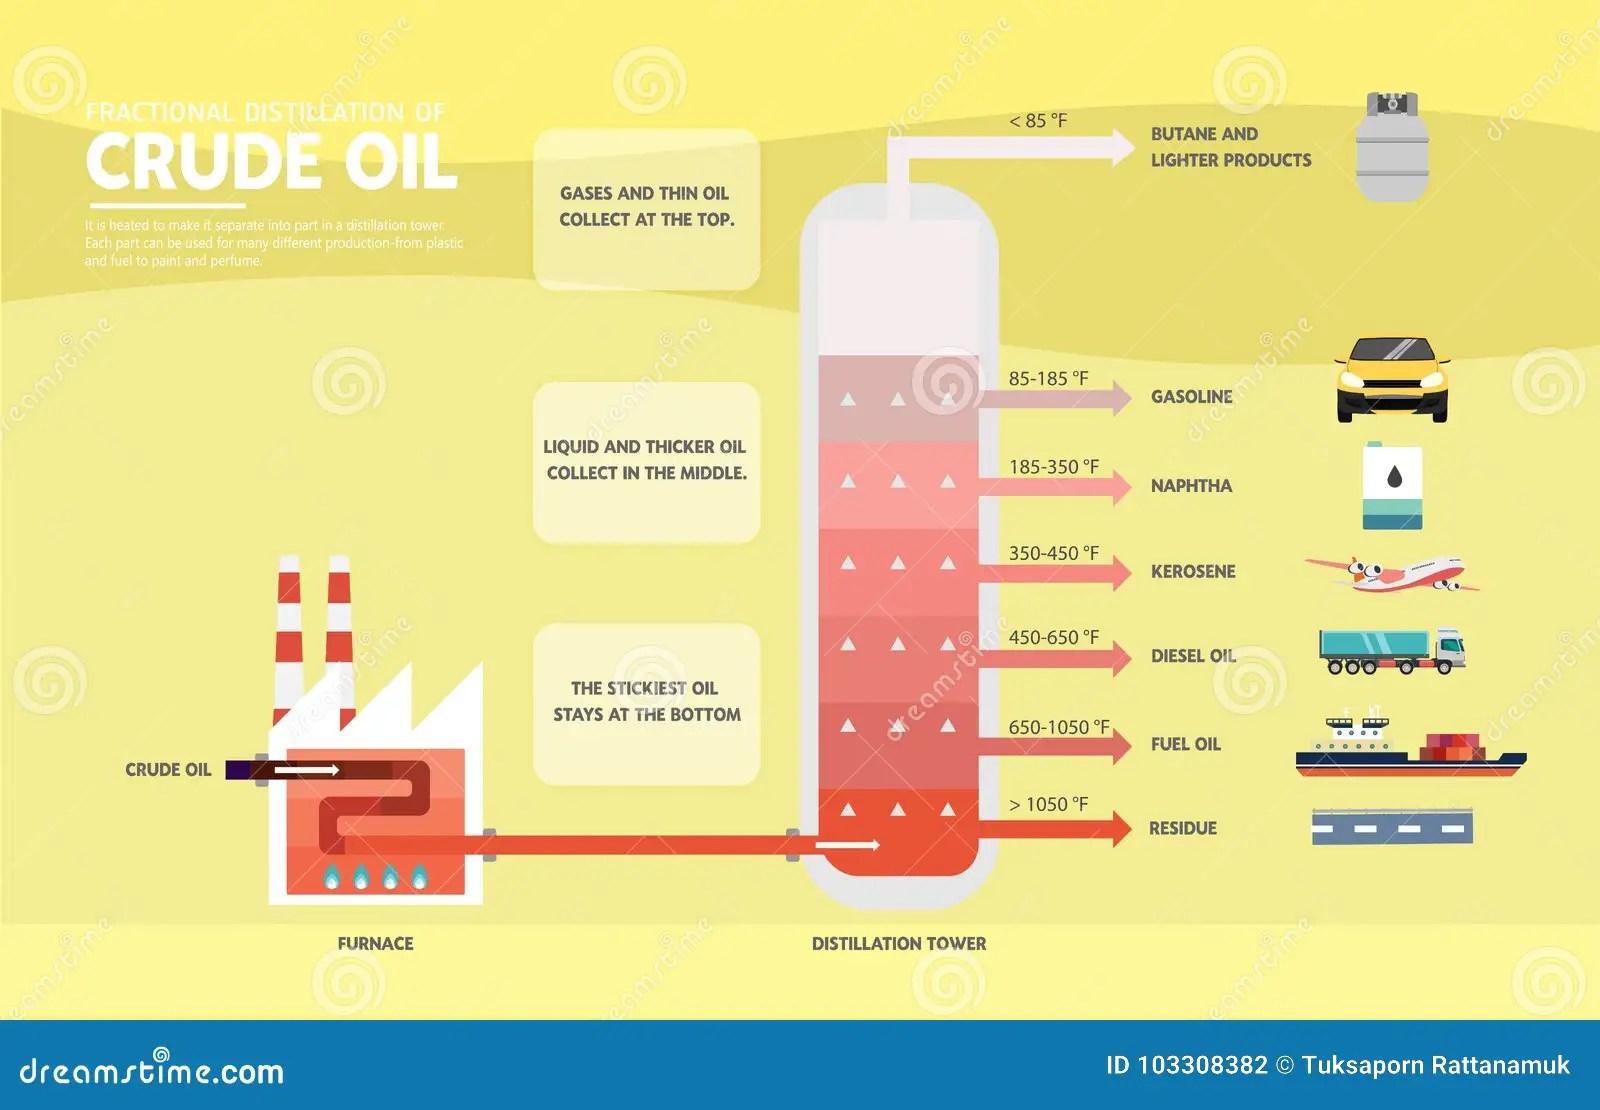 Fractional Distillation Of Crude Oil Diagram Stock Vector